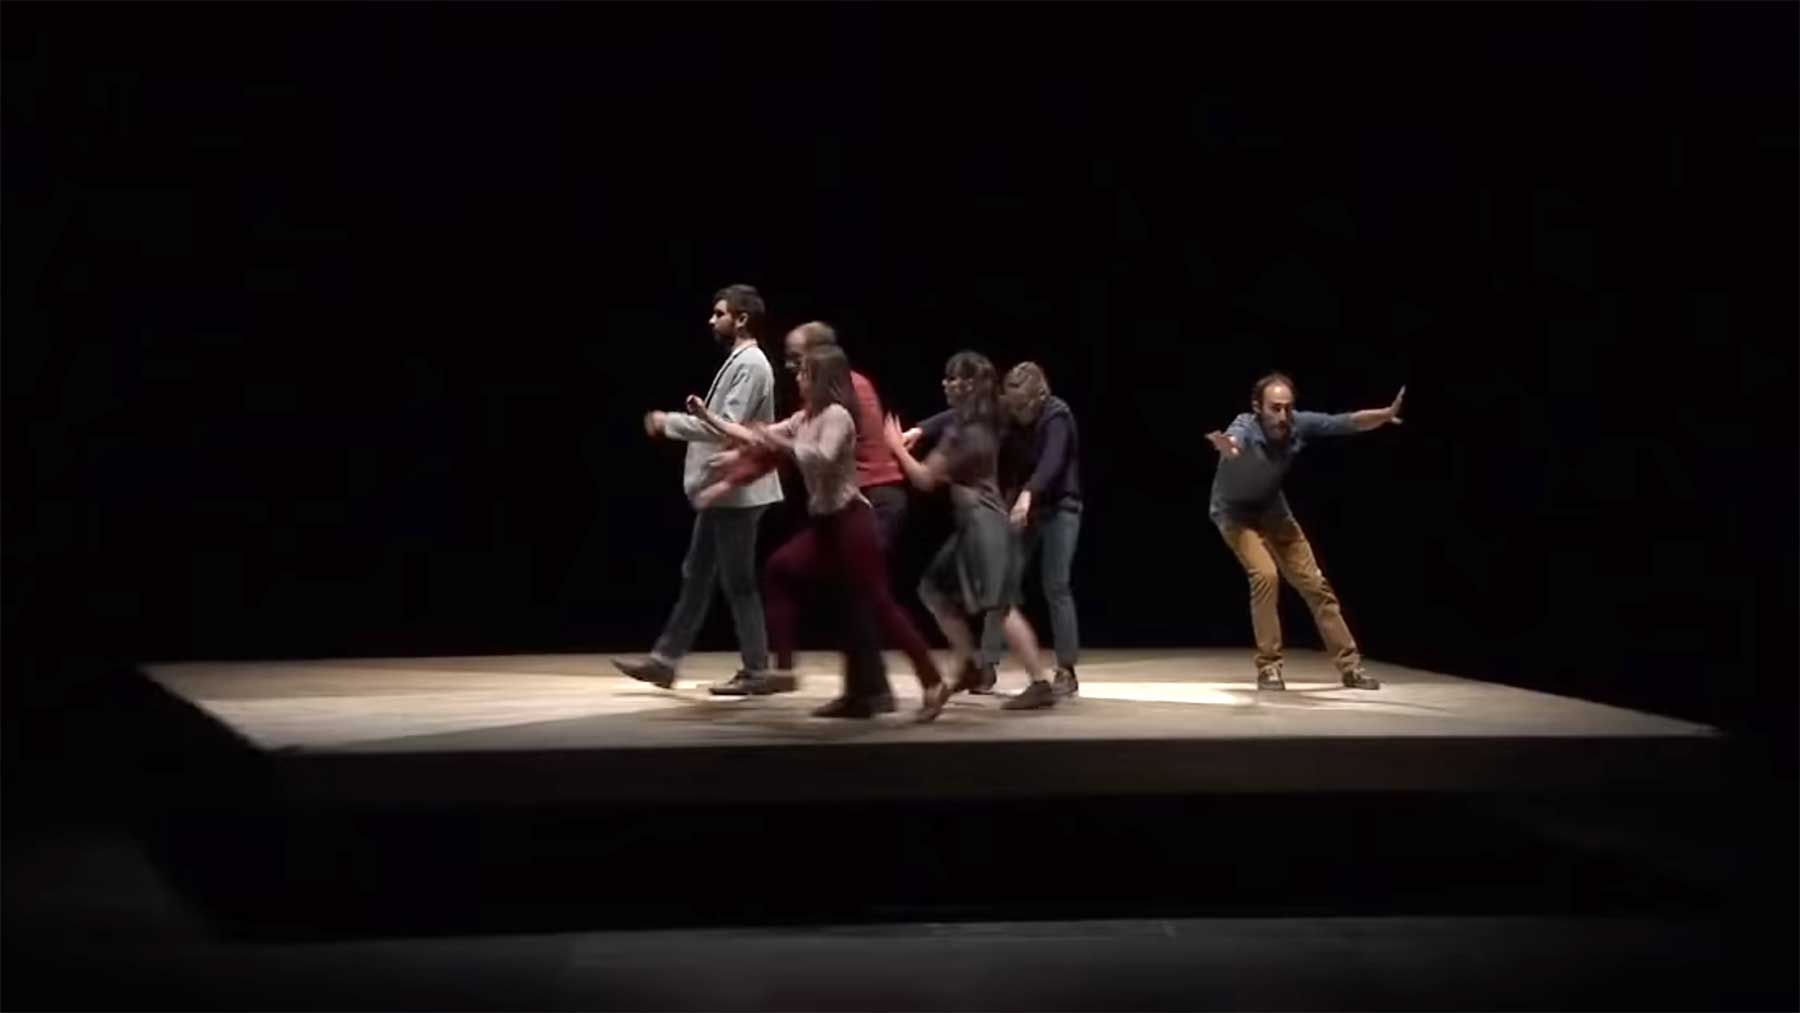 Choreographie auf Drehscheibe Yoann-Bourgeois-CCN2-Celui-qui-tombe